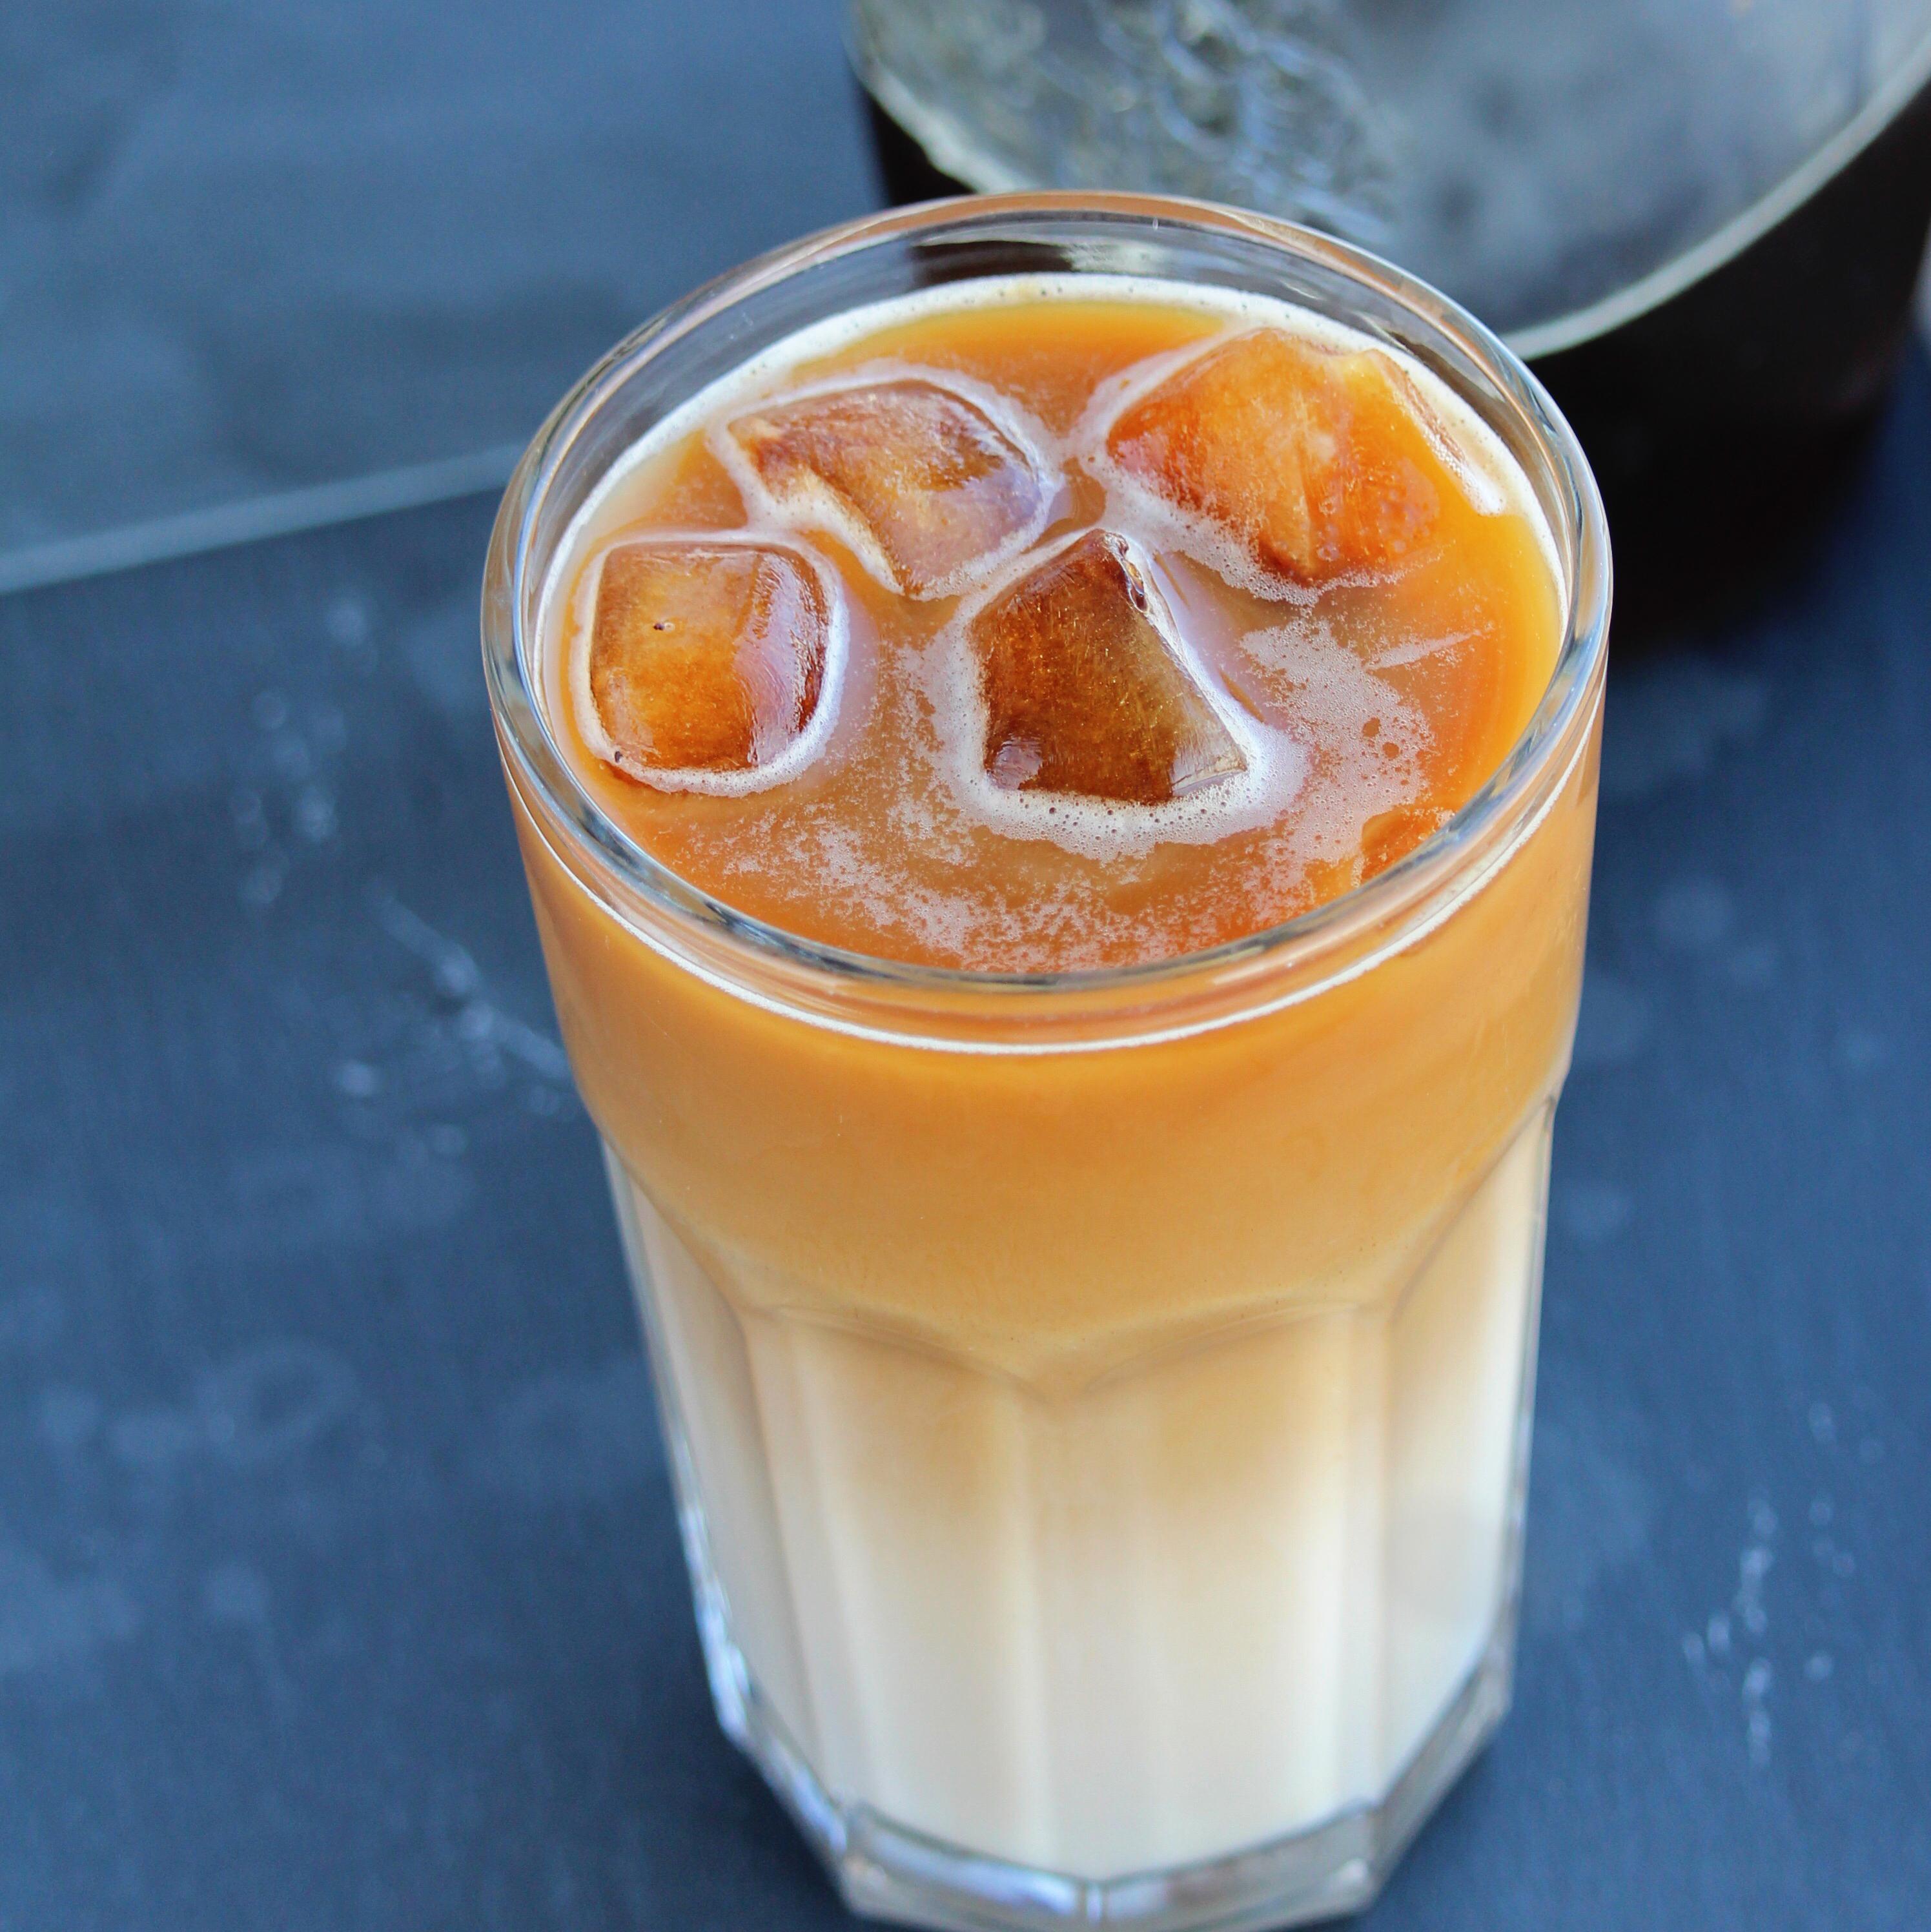 Cold Brew and Almond Milk Latte